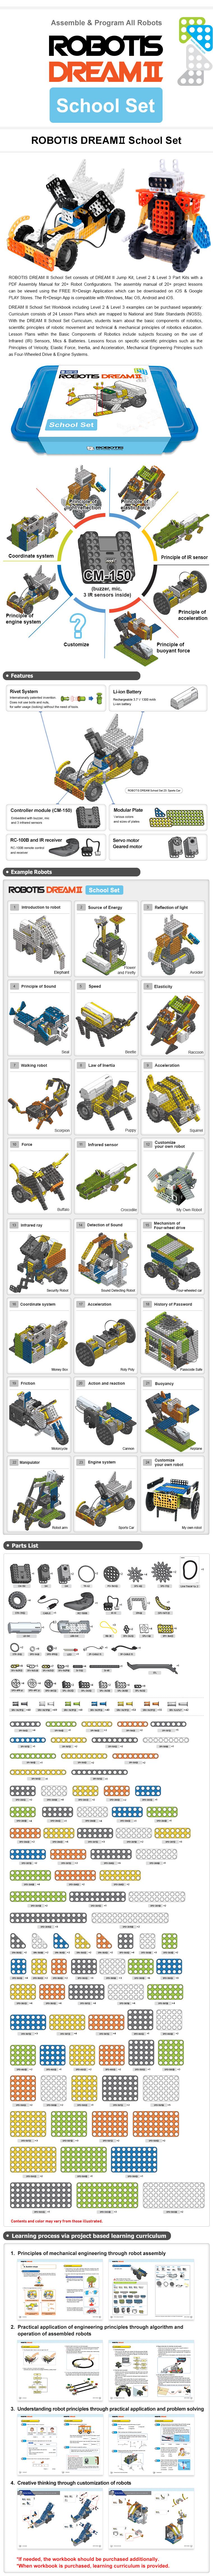 robotis-dream-school-set.jpg